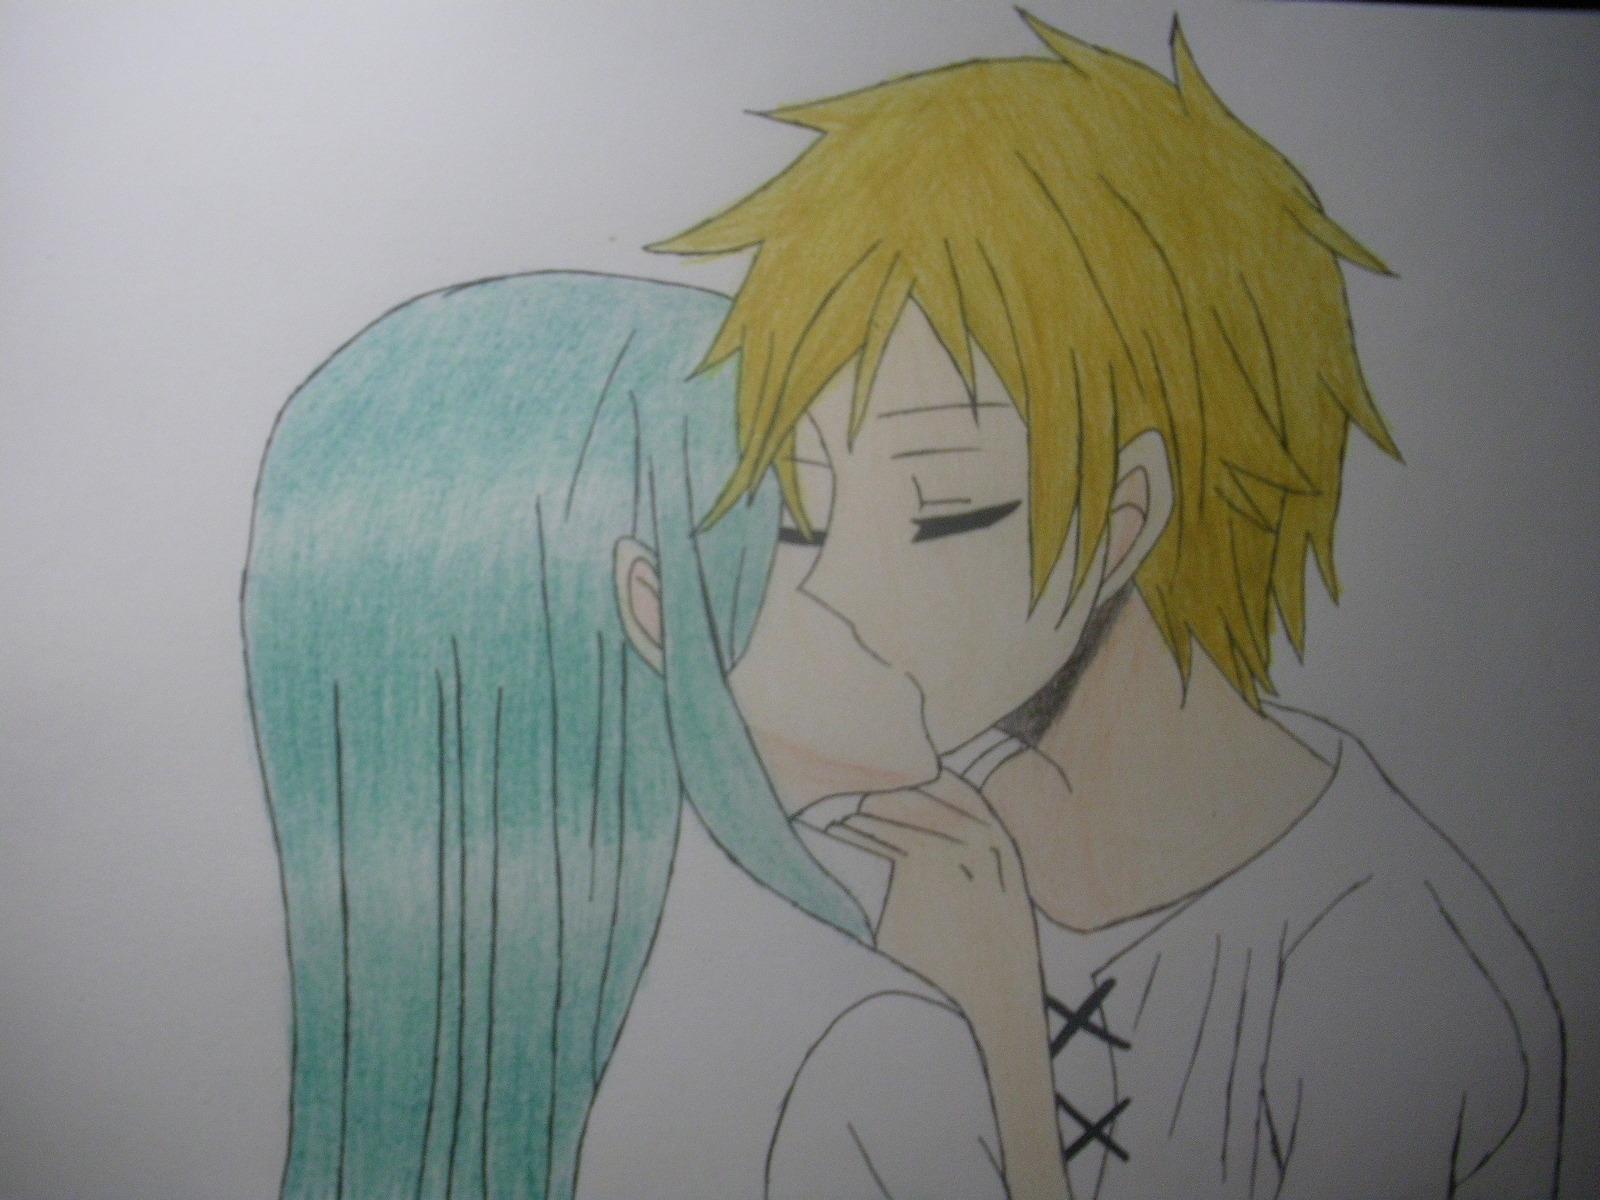 【参赛】手绘kido和kano接吻